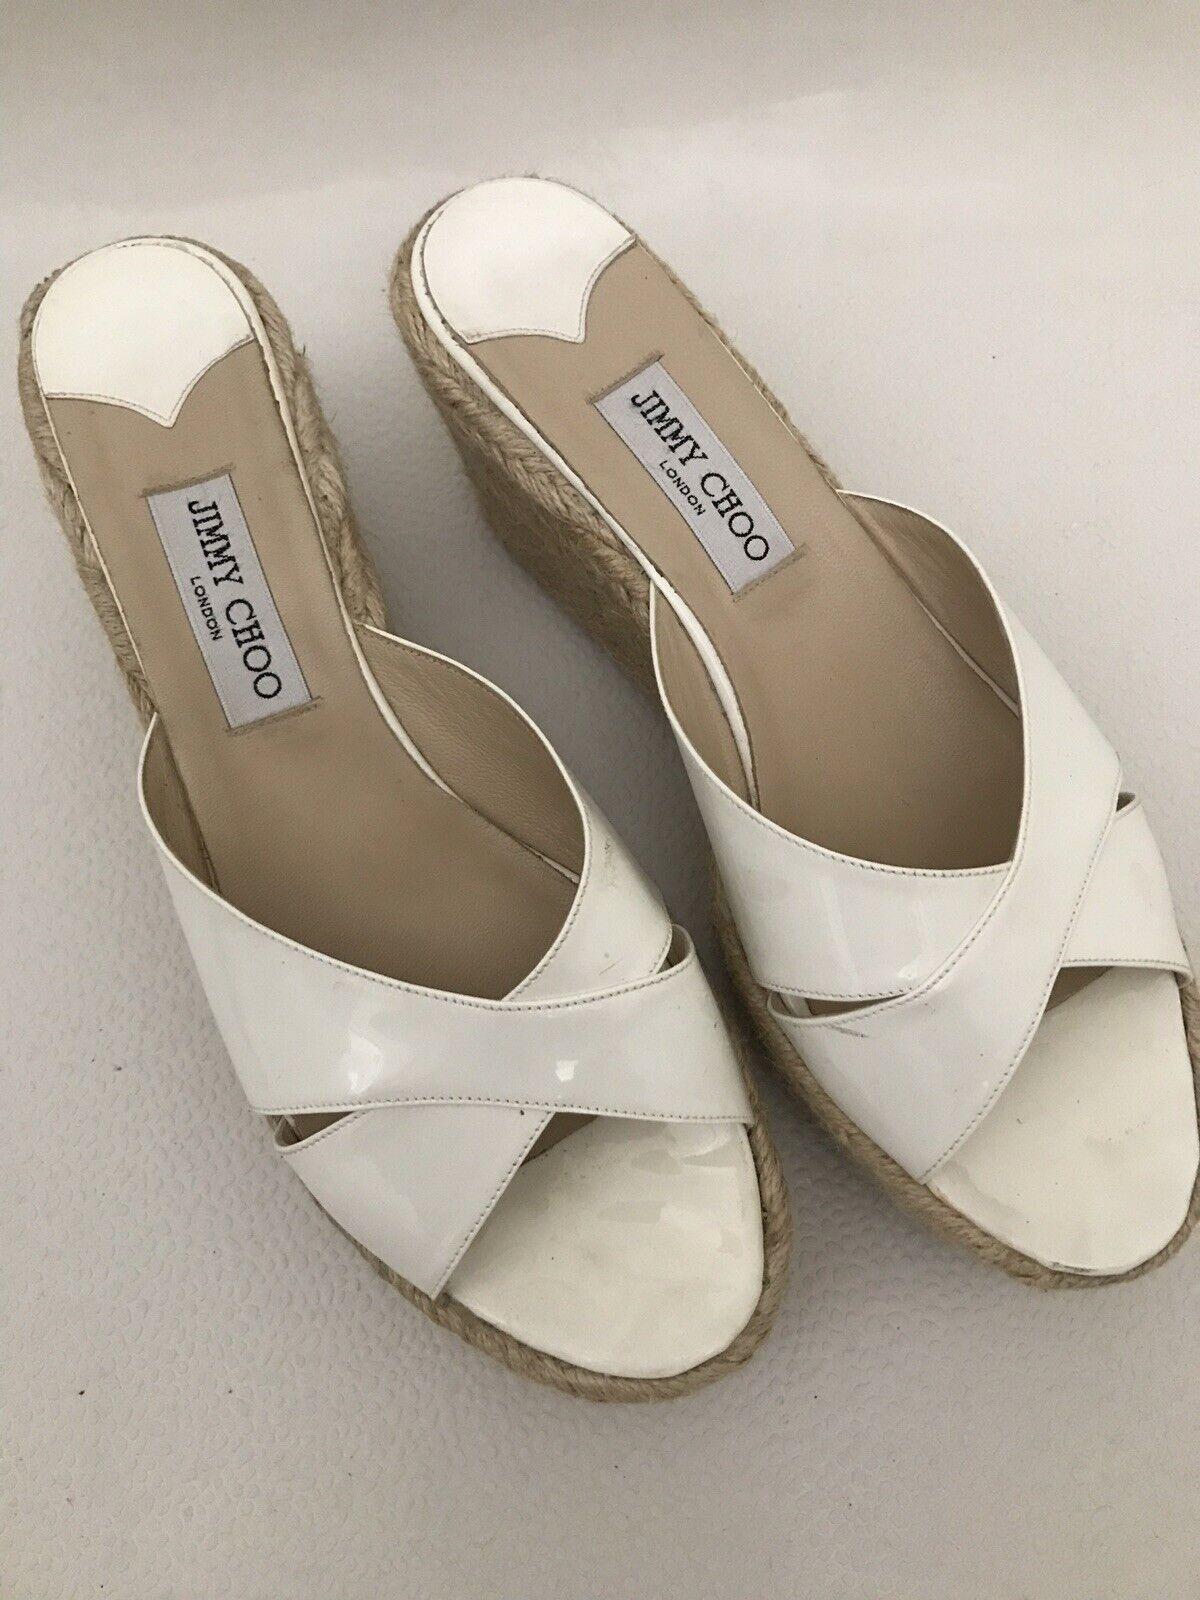 Jimmy  Choo Phyllis Patent Leather Wedge Peep Toe Sandal DimensioneEU 42 US 9  negozi al dettaglio